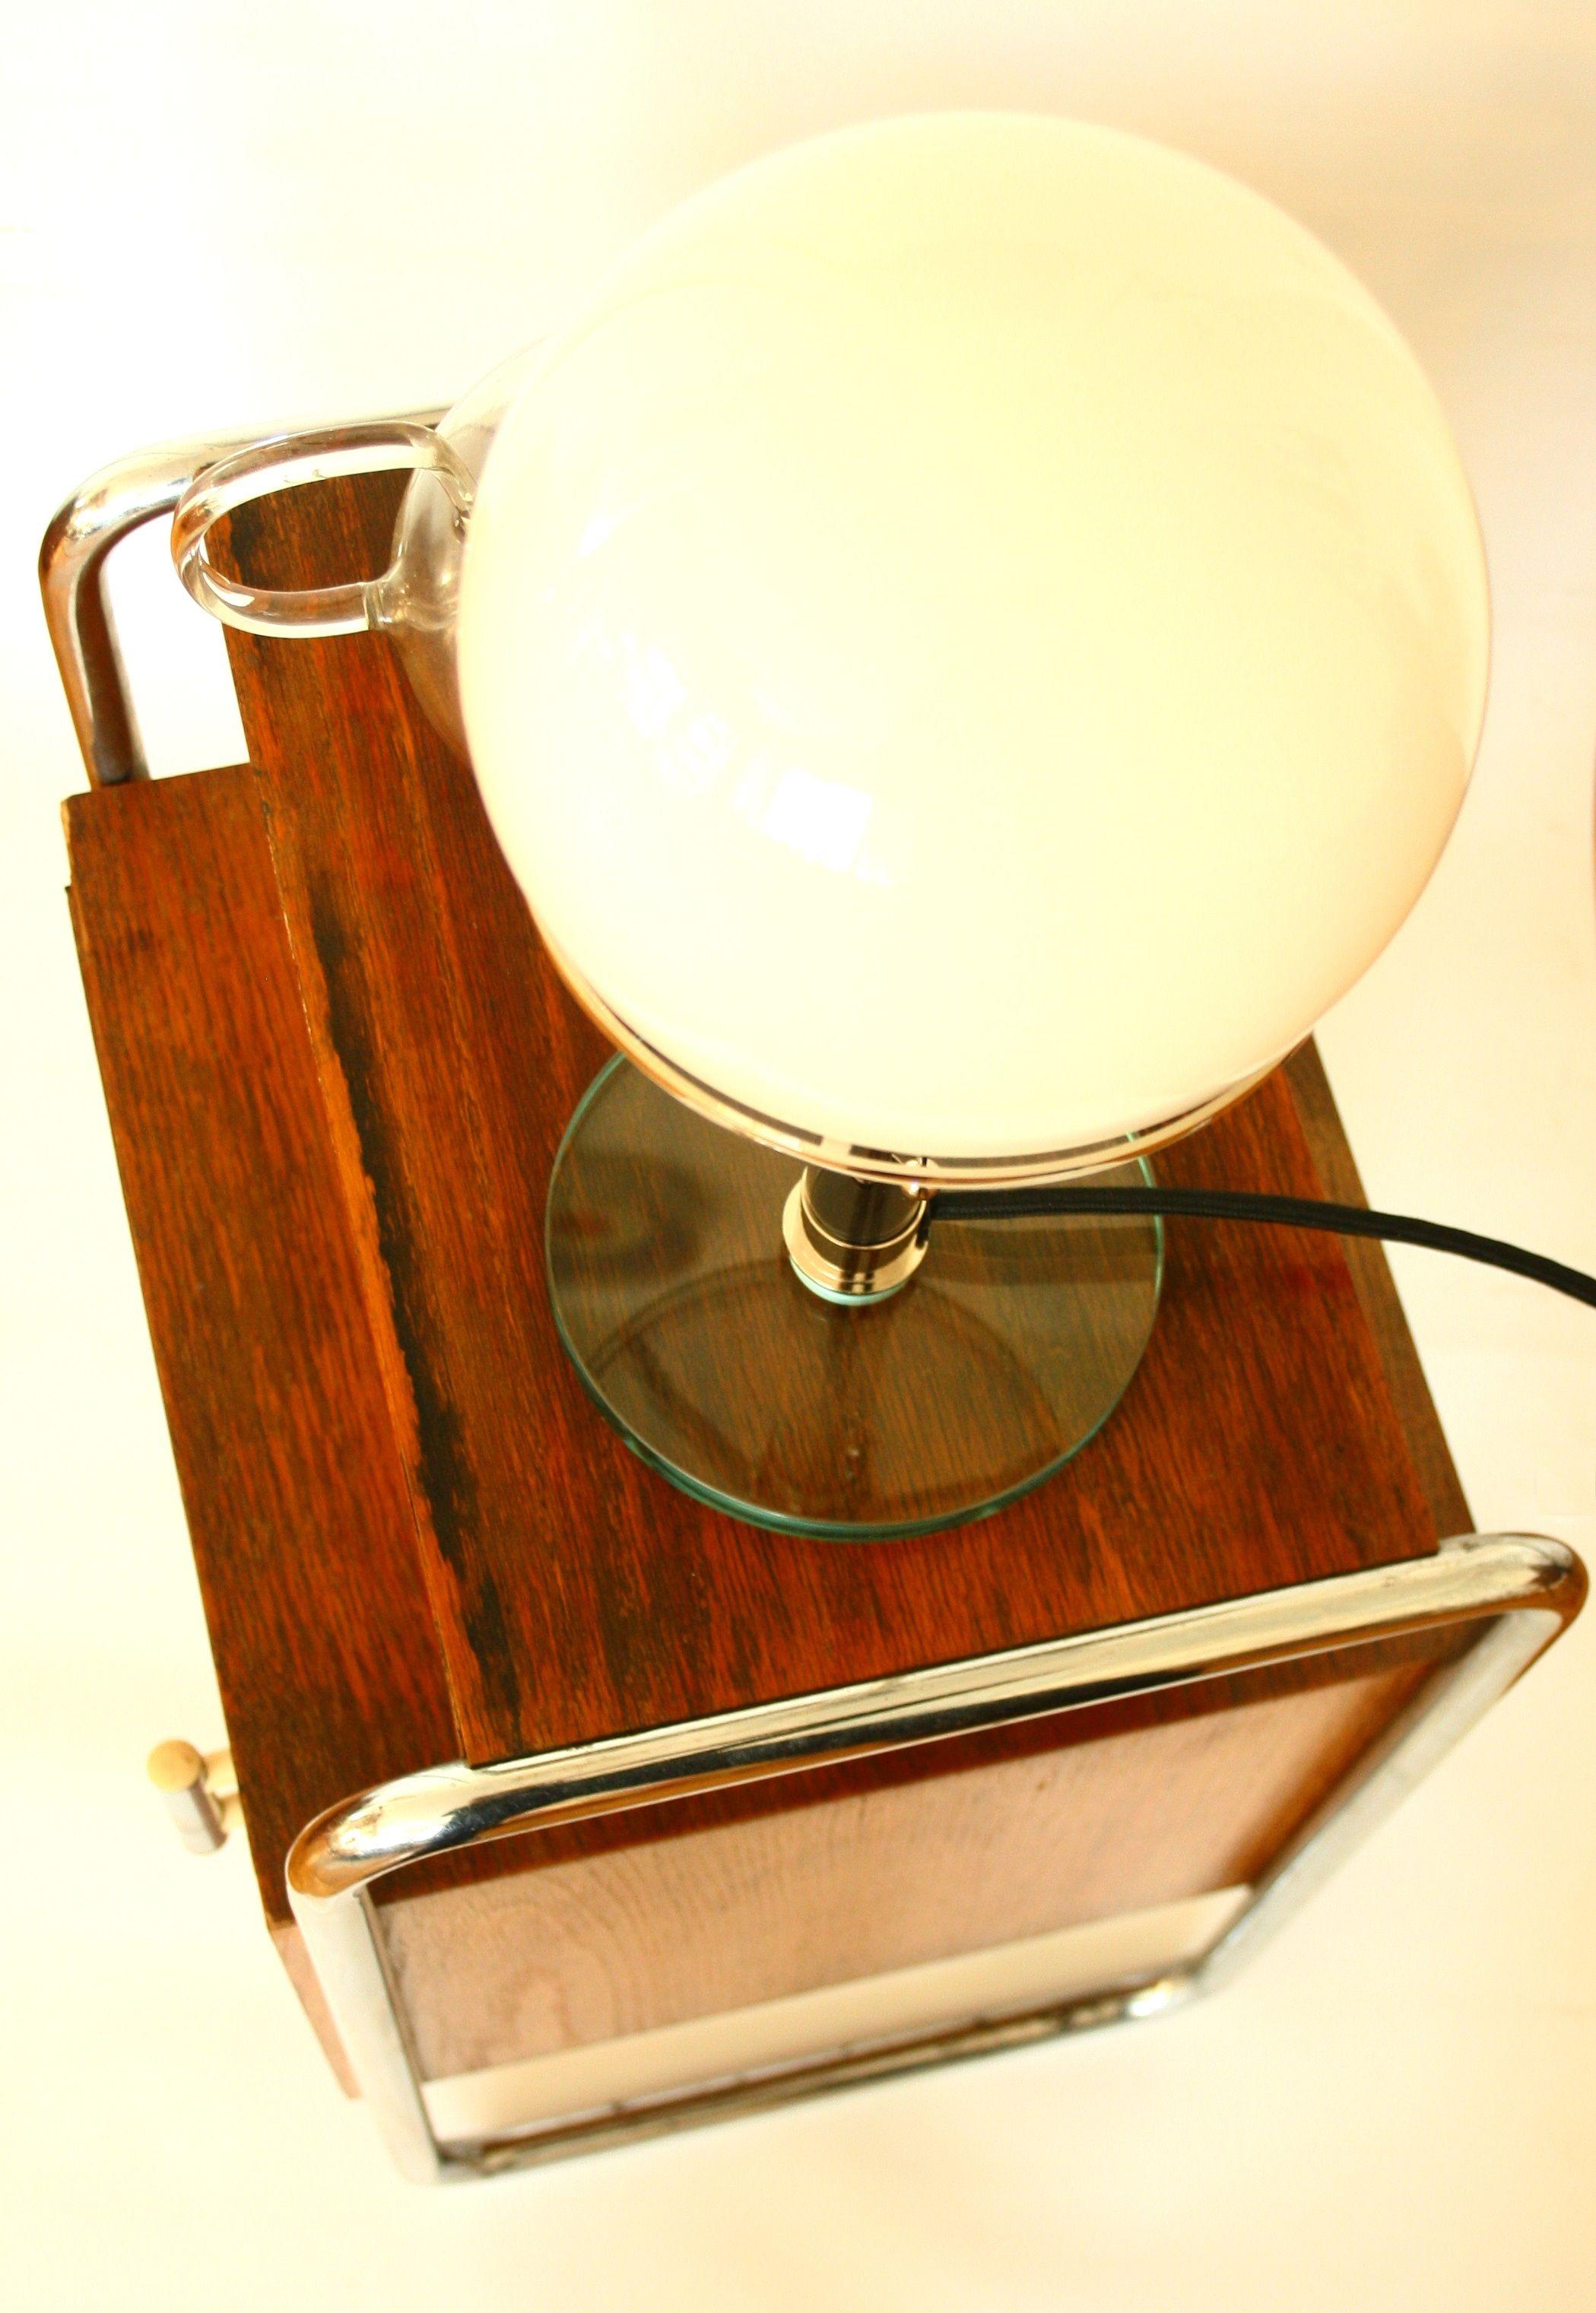 3c90eef9075071cb704c1573647e2fba Incroyable De Table Basse Le Corbusier Concept